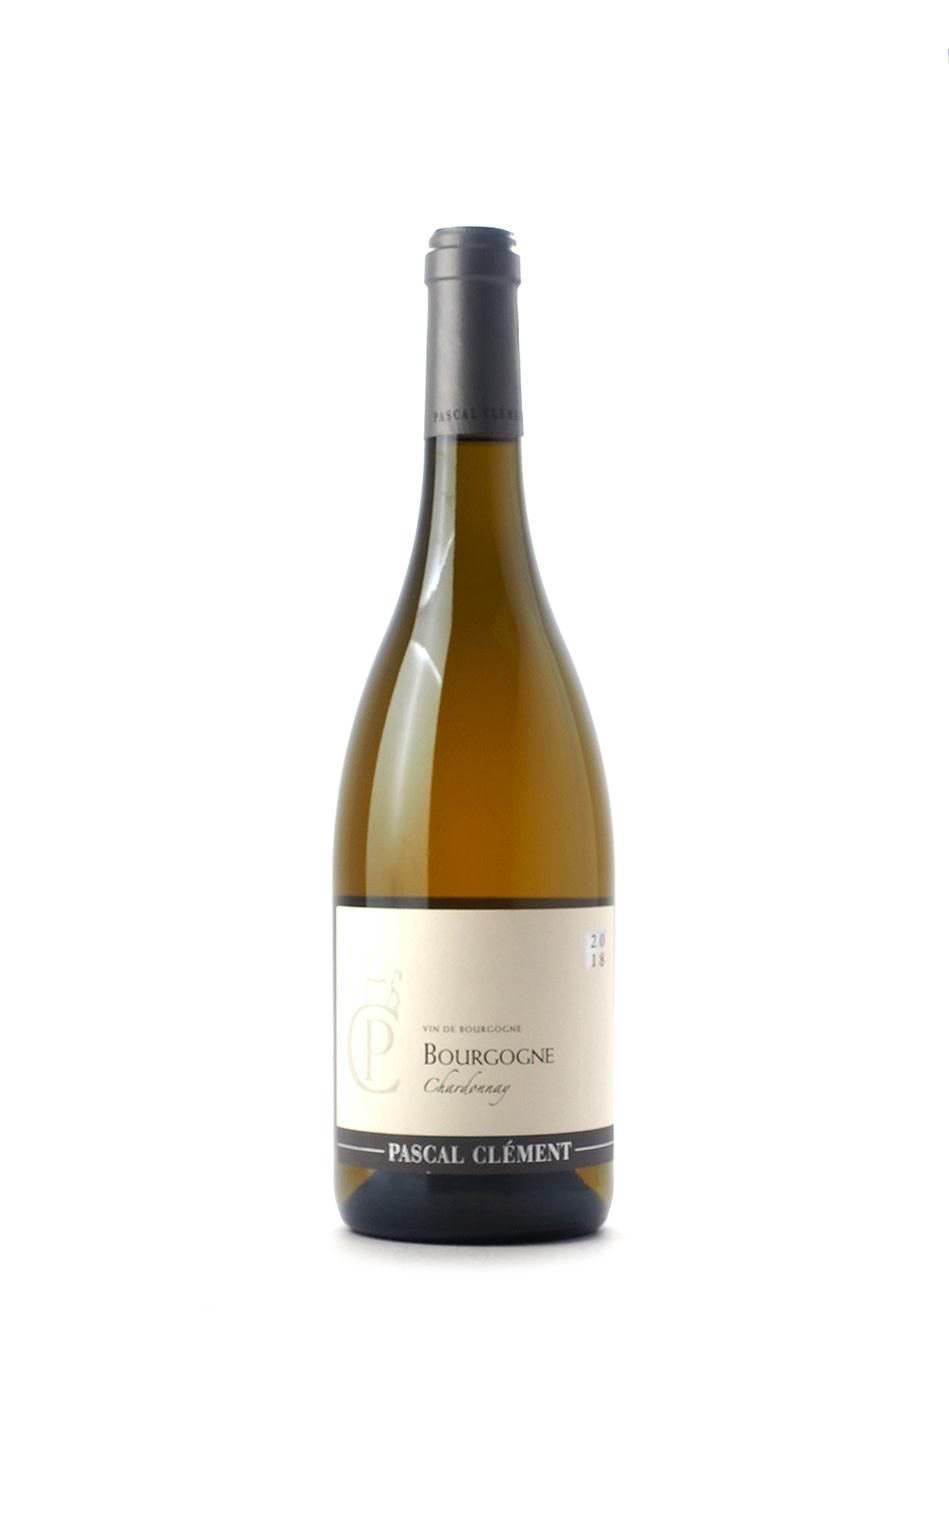 Pascal Clement Bourgogne Blanc 2018